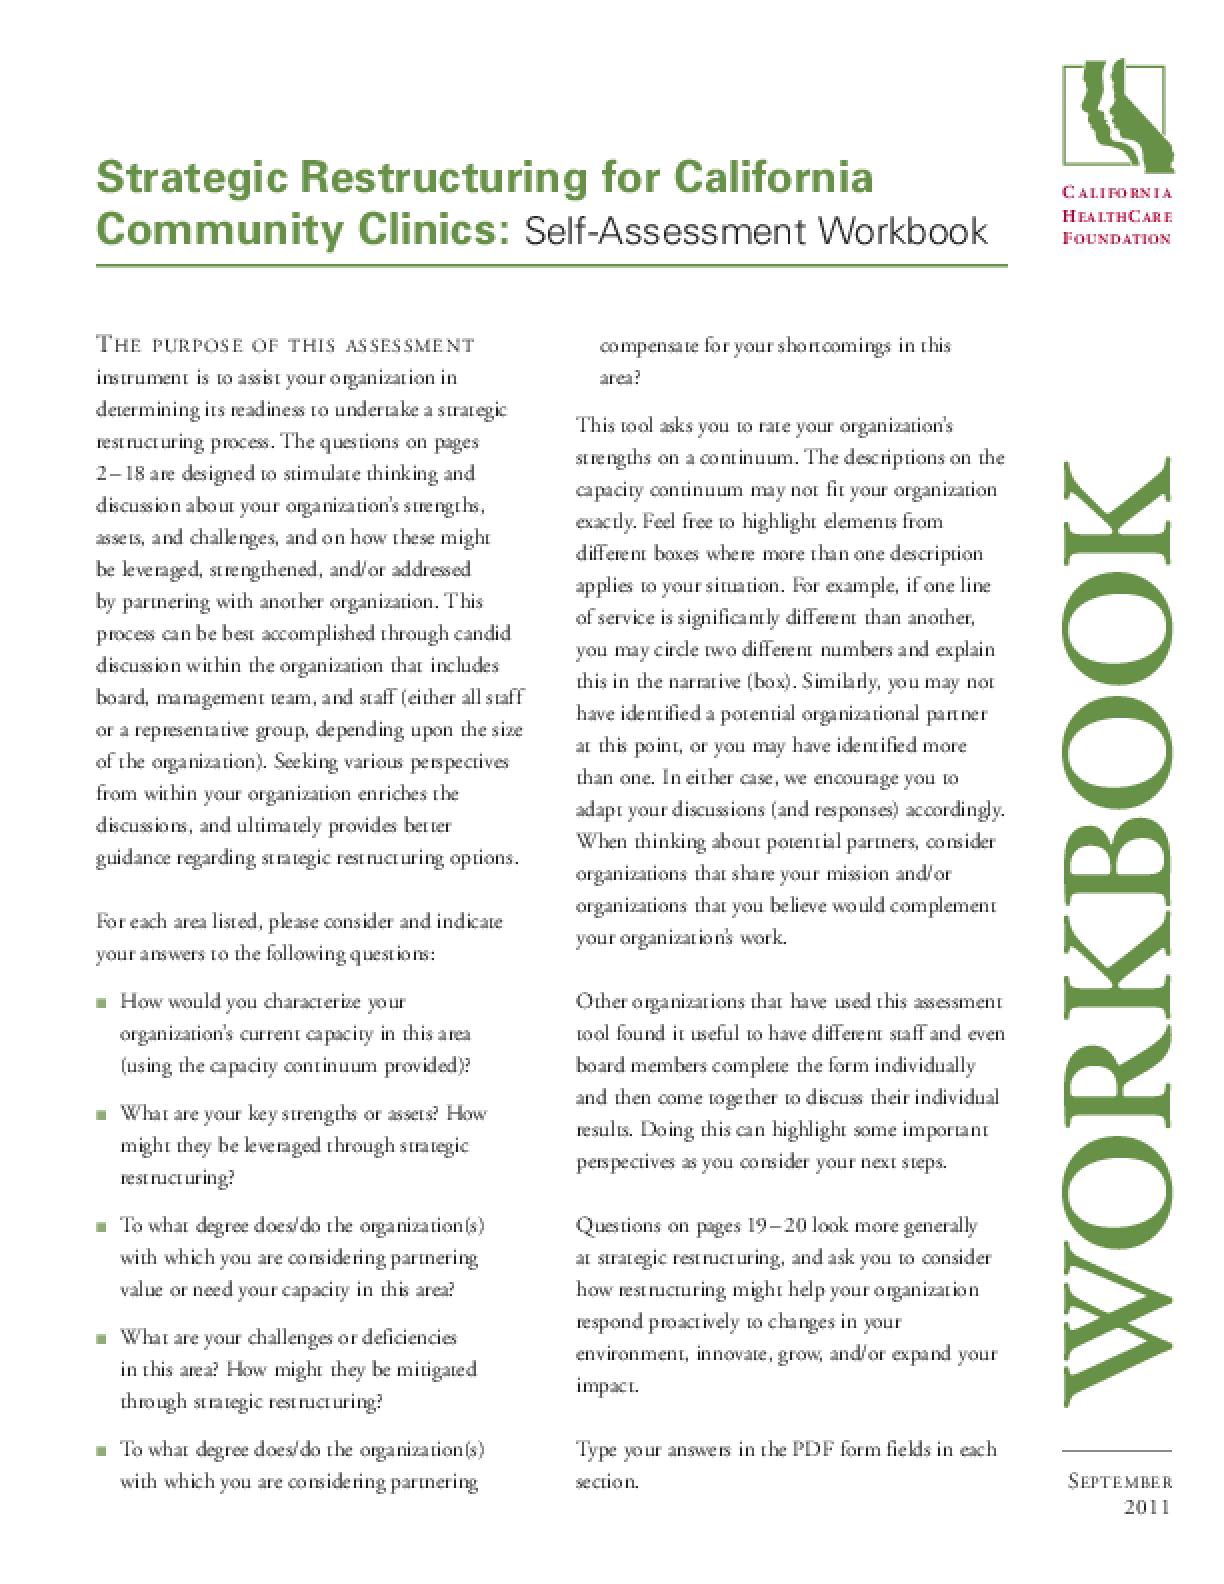 Strategic Restructuring for California Community Clinics: Self-Assessment Workbook